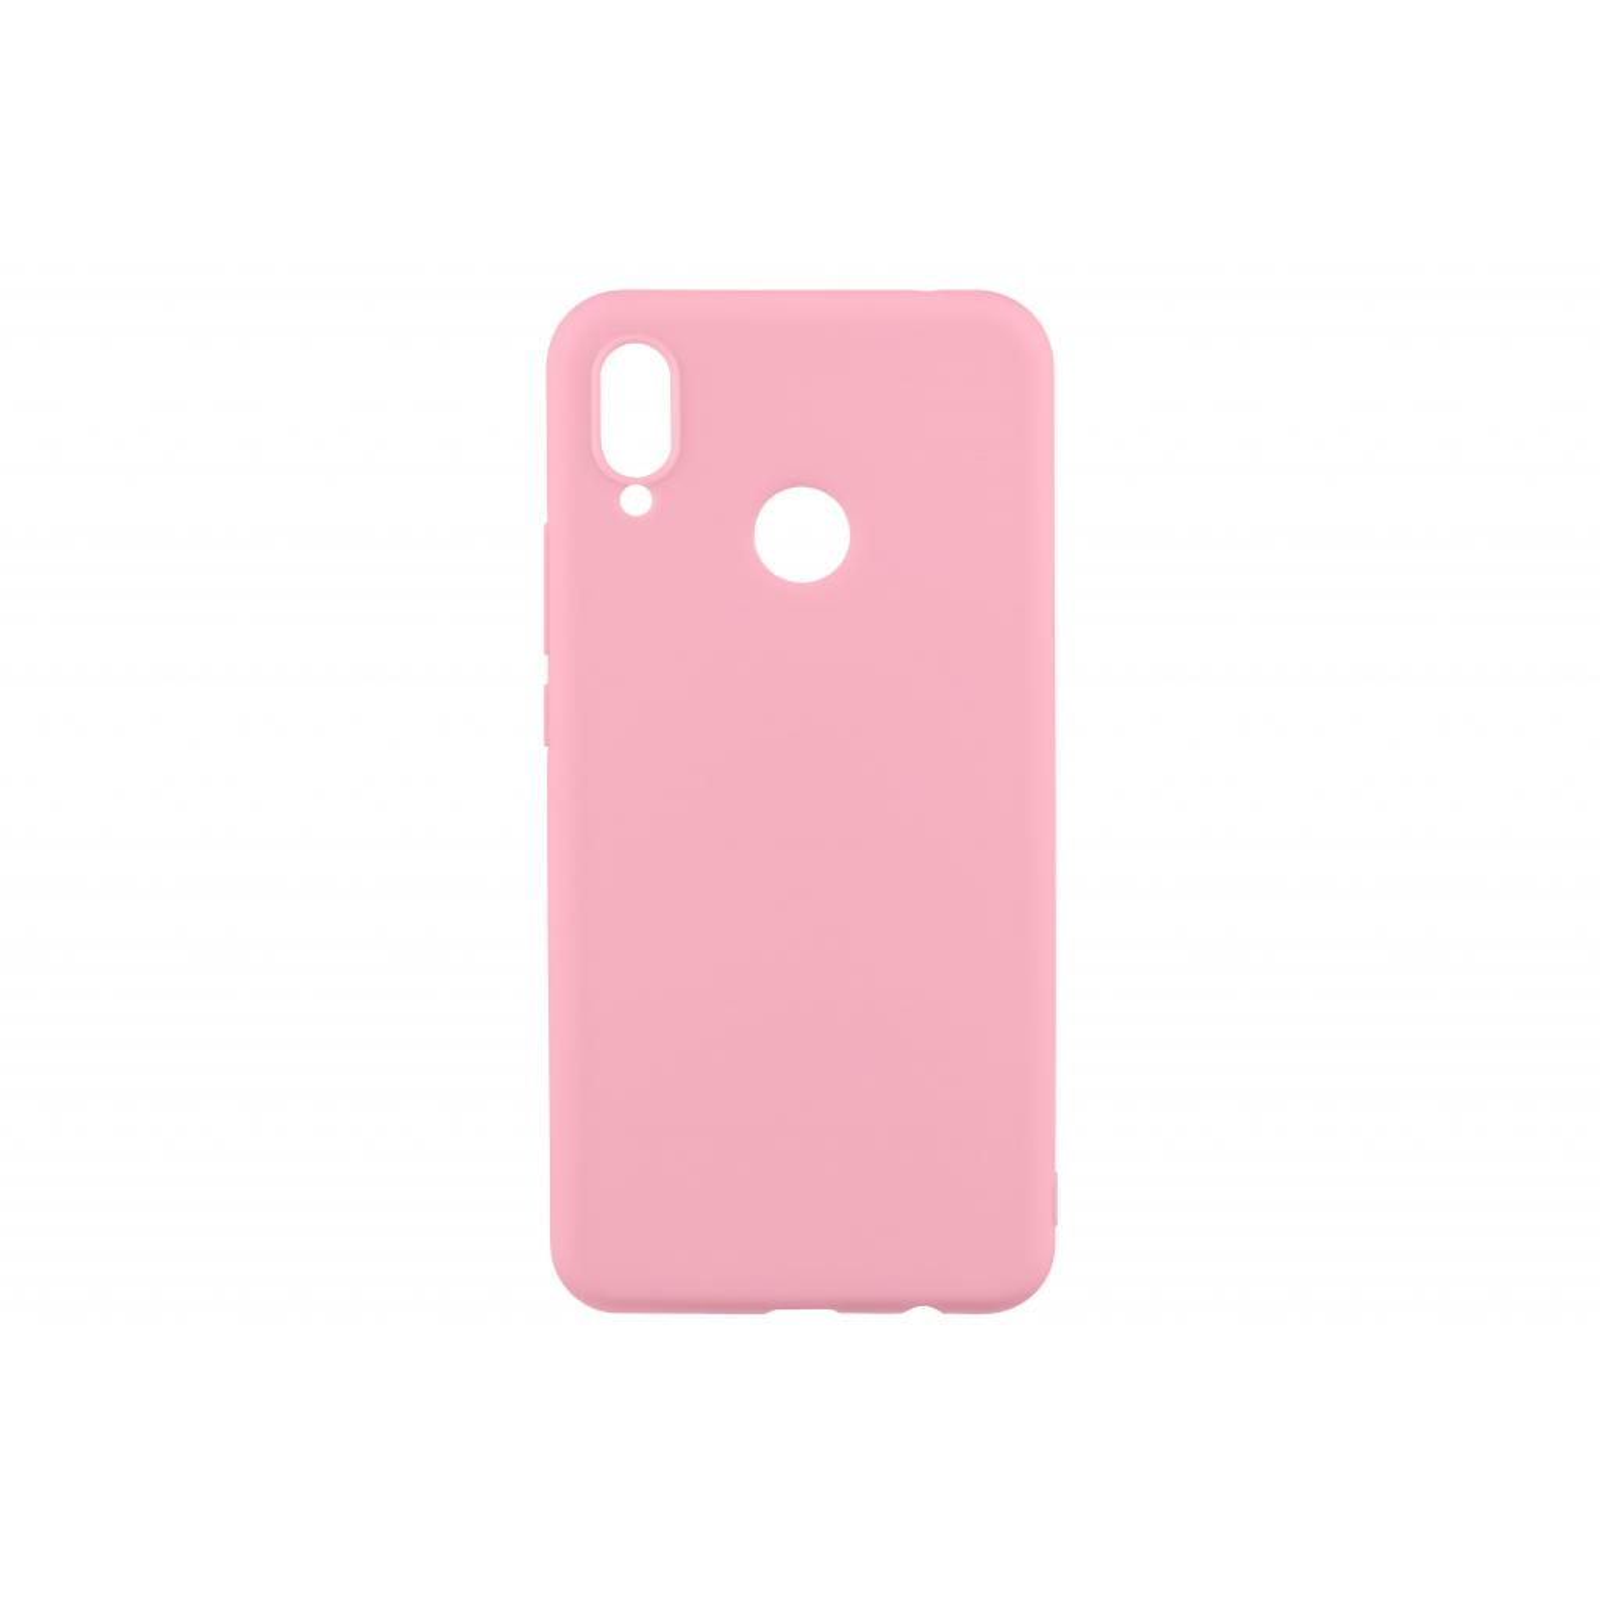 Чехол для моб. телефона 2E Huawei Y6 2018, Soft touch, Pink (2E-H-Y6-18-NKST-PK)